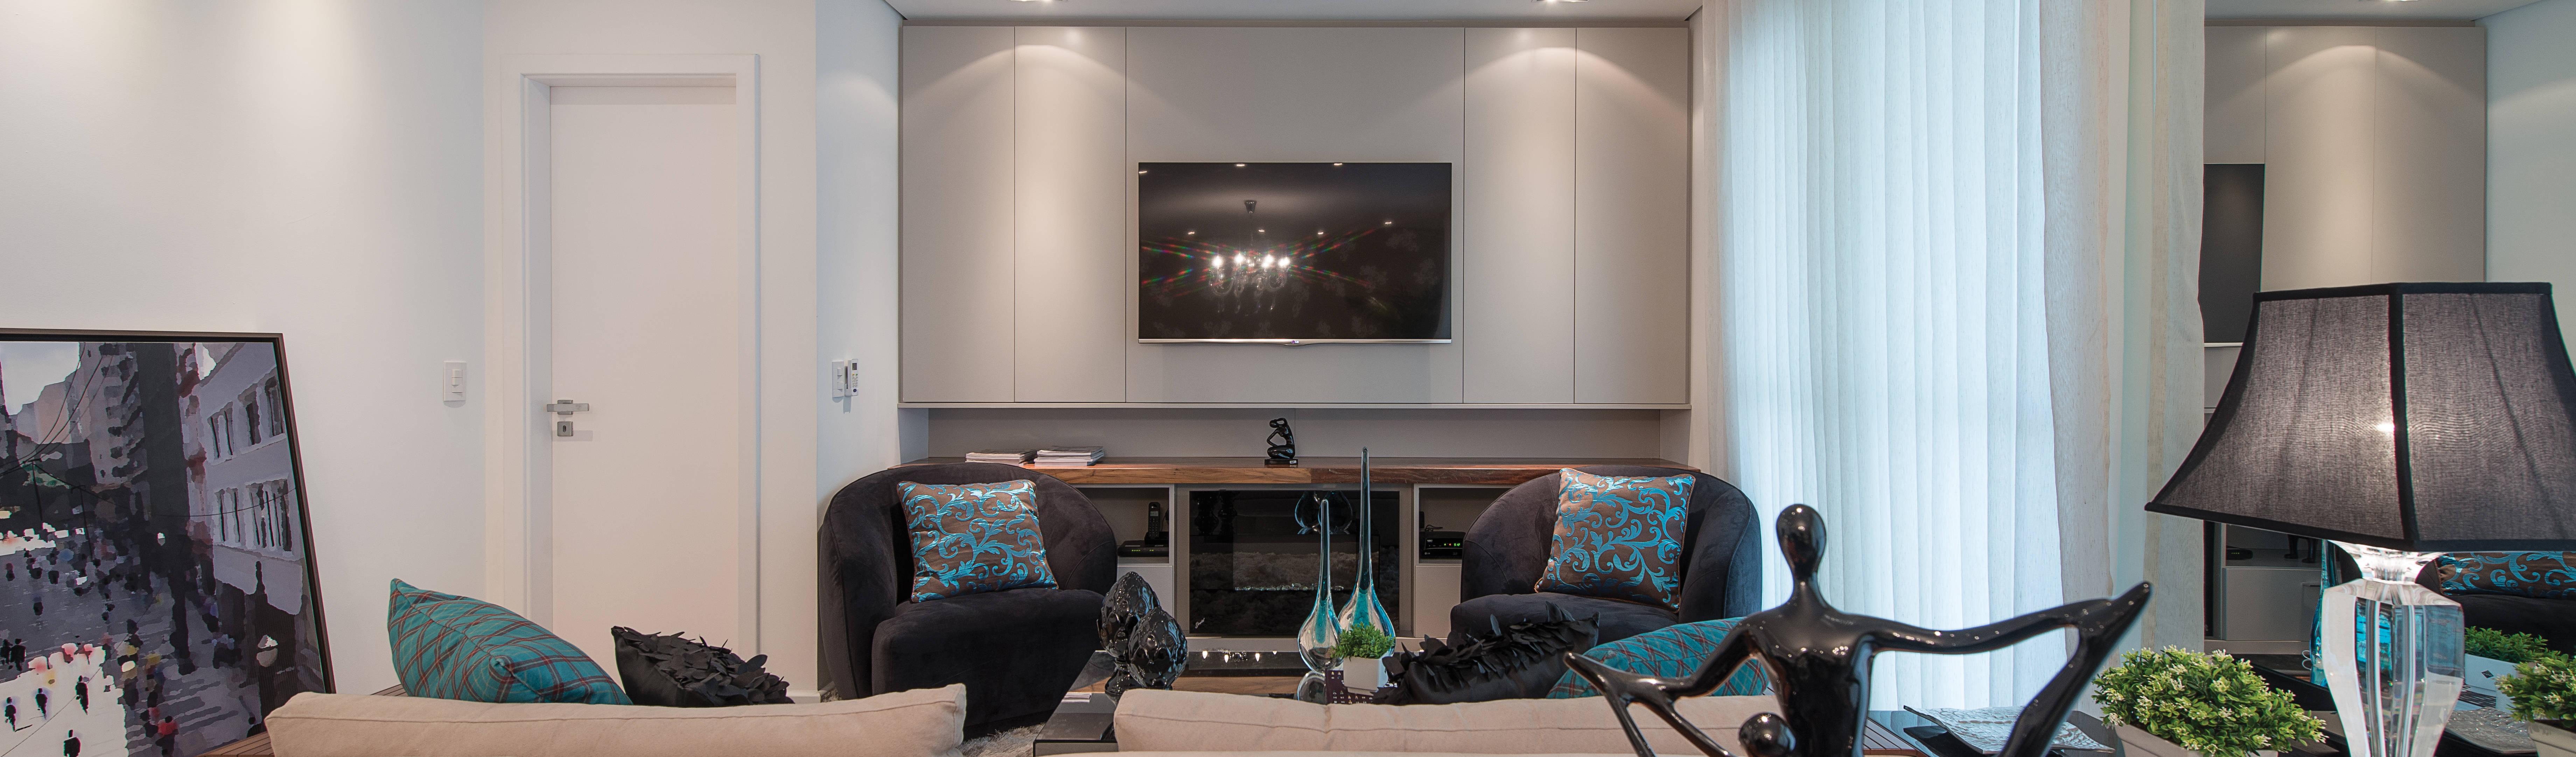 Factus Arquitetura Planejamento Interiores